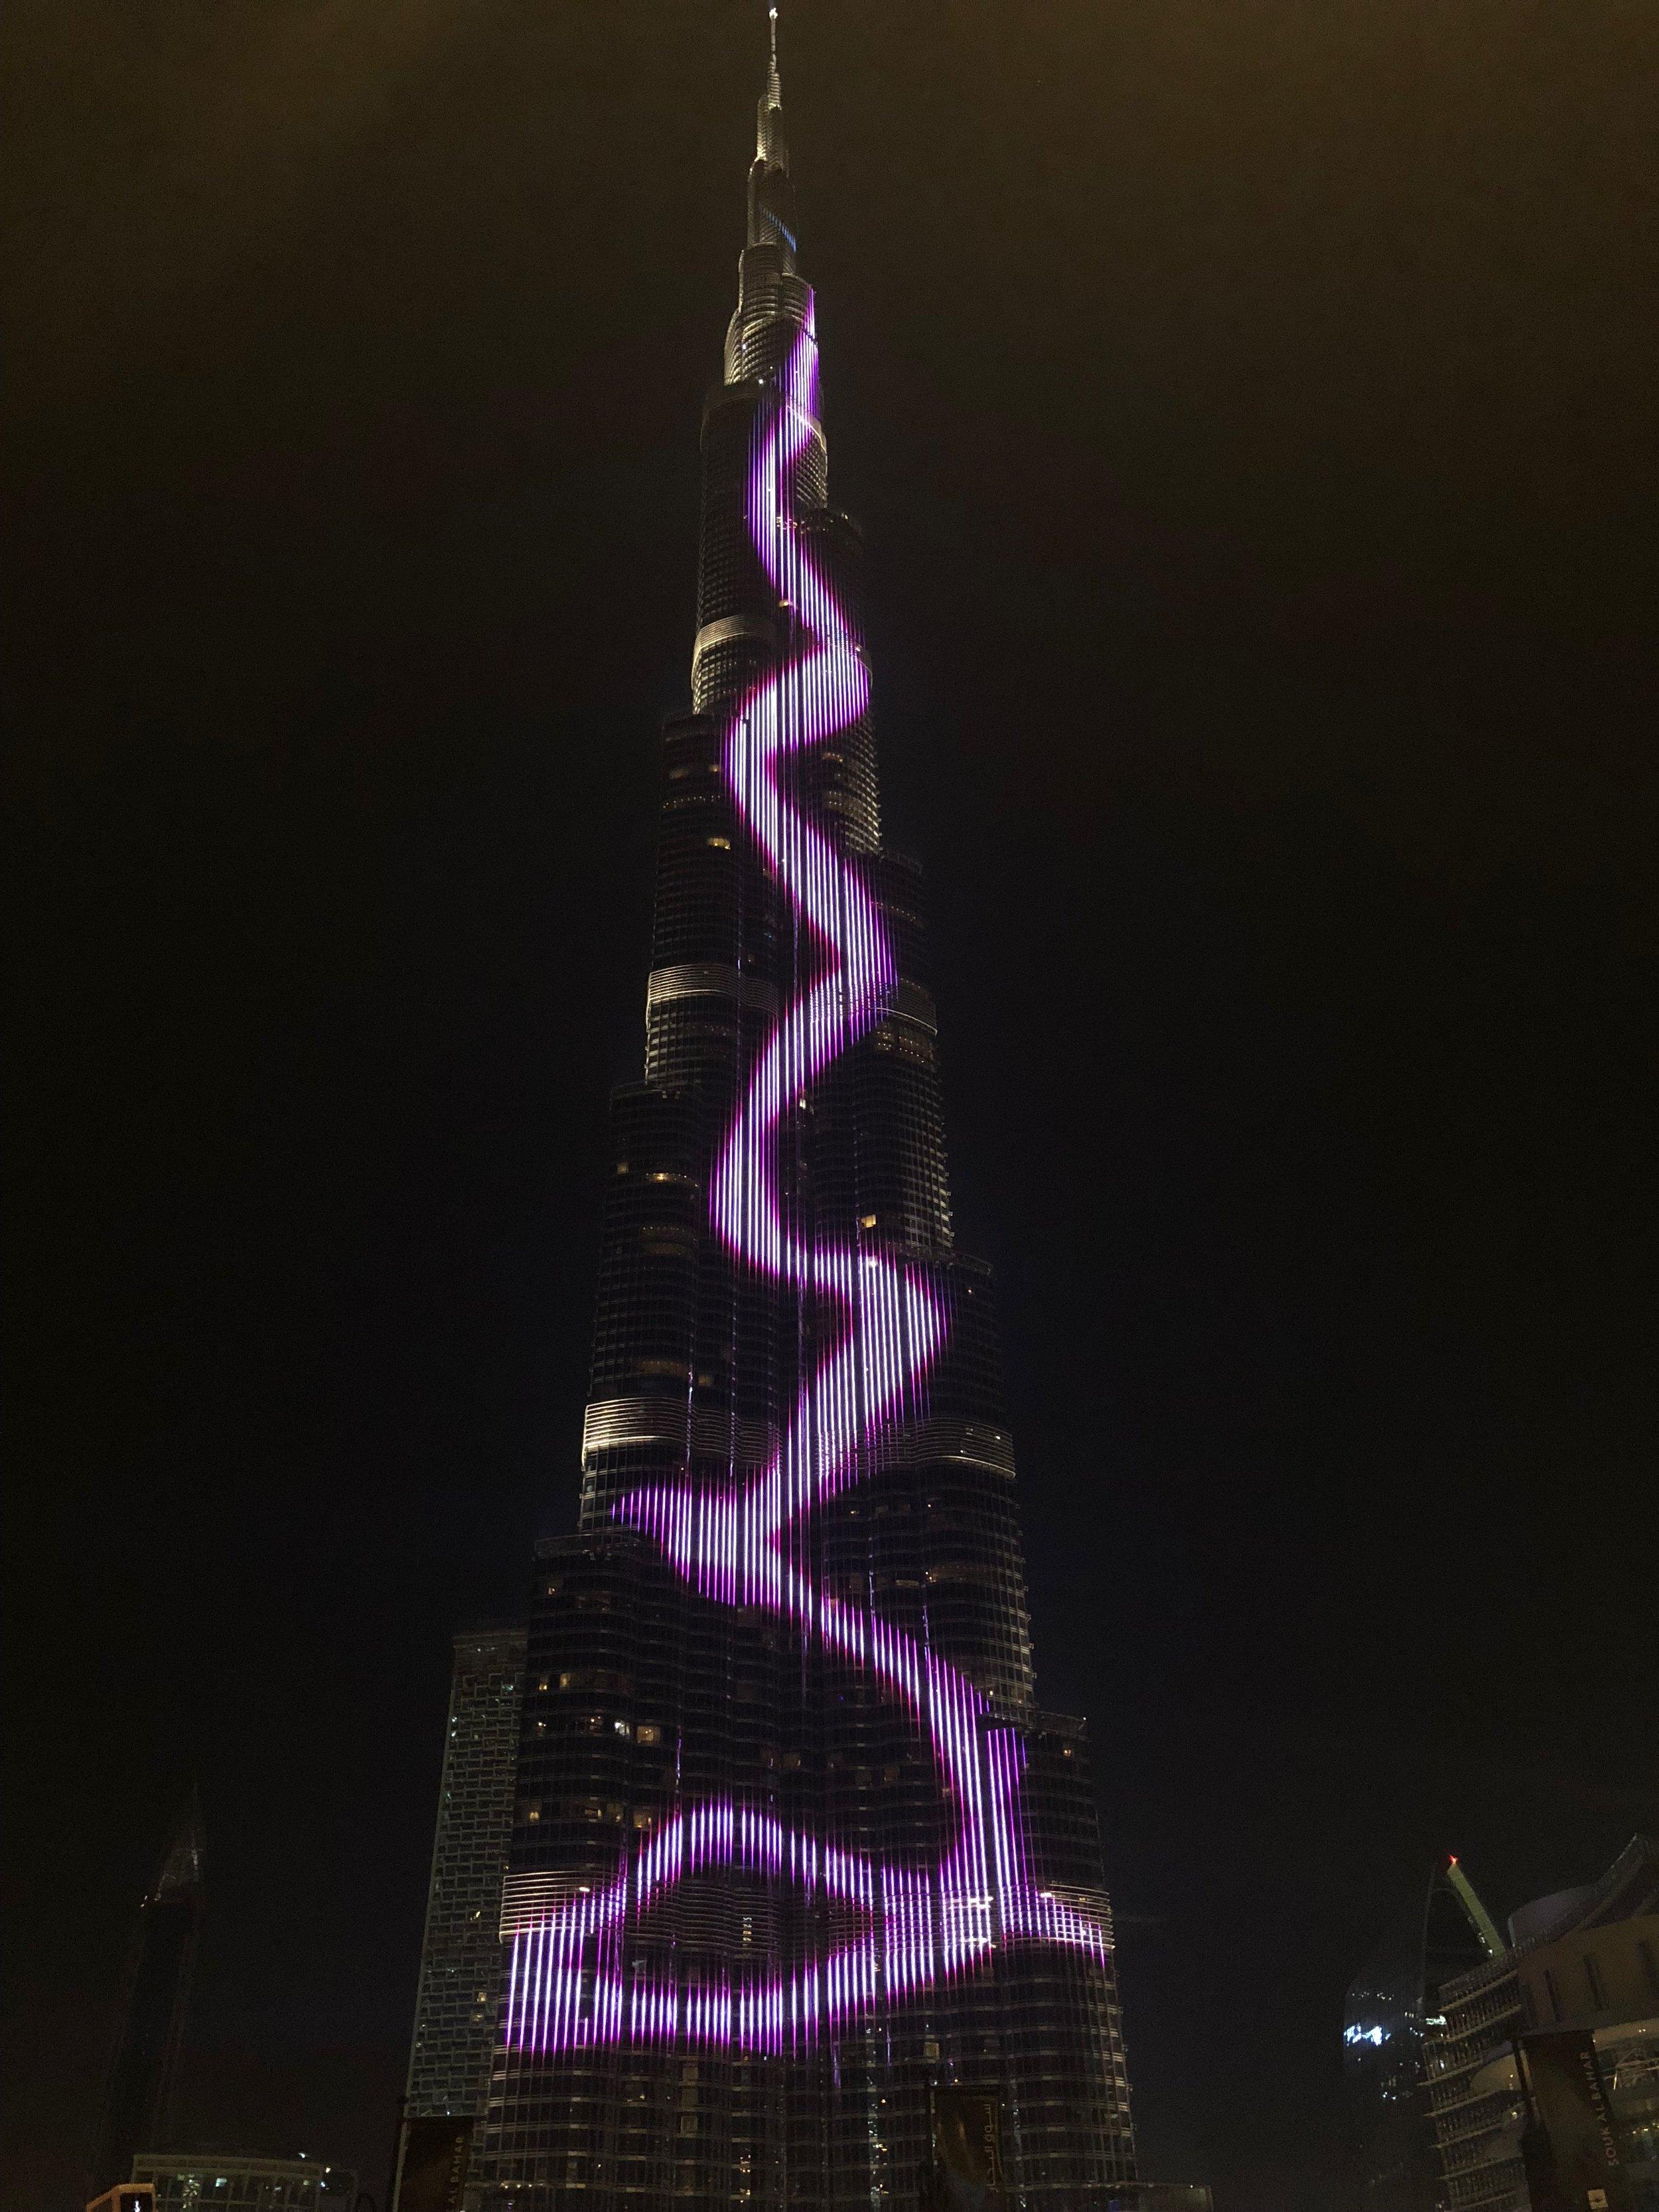 Burj Khalifa......160 stories high